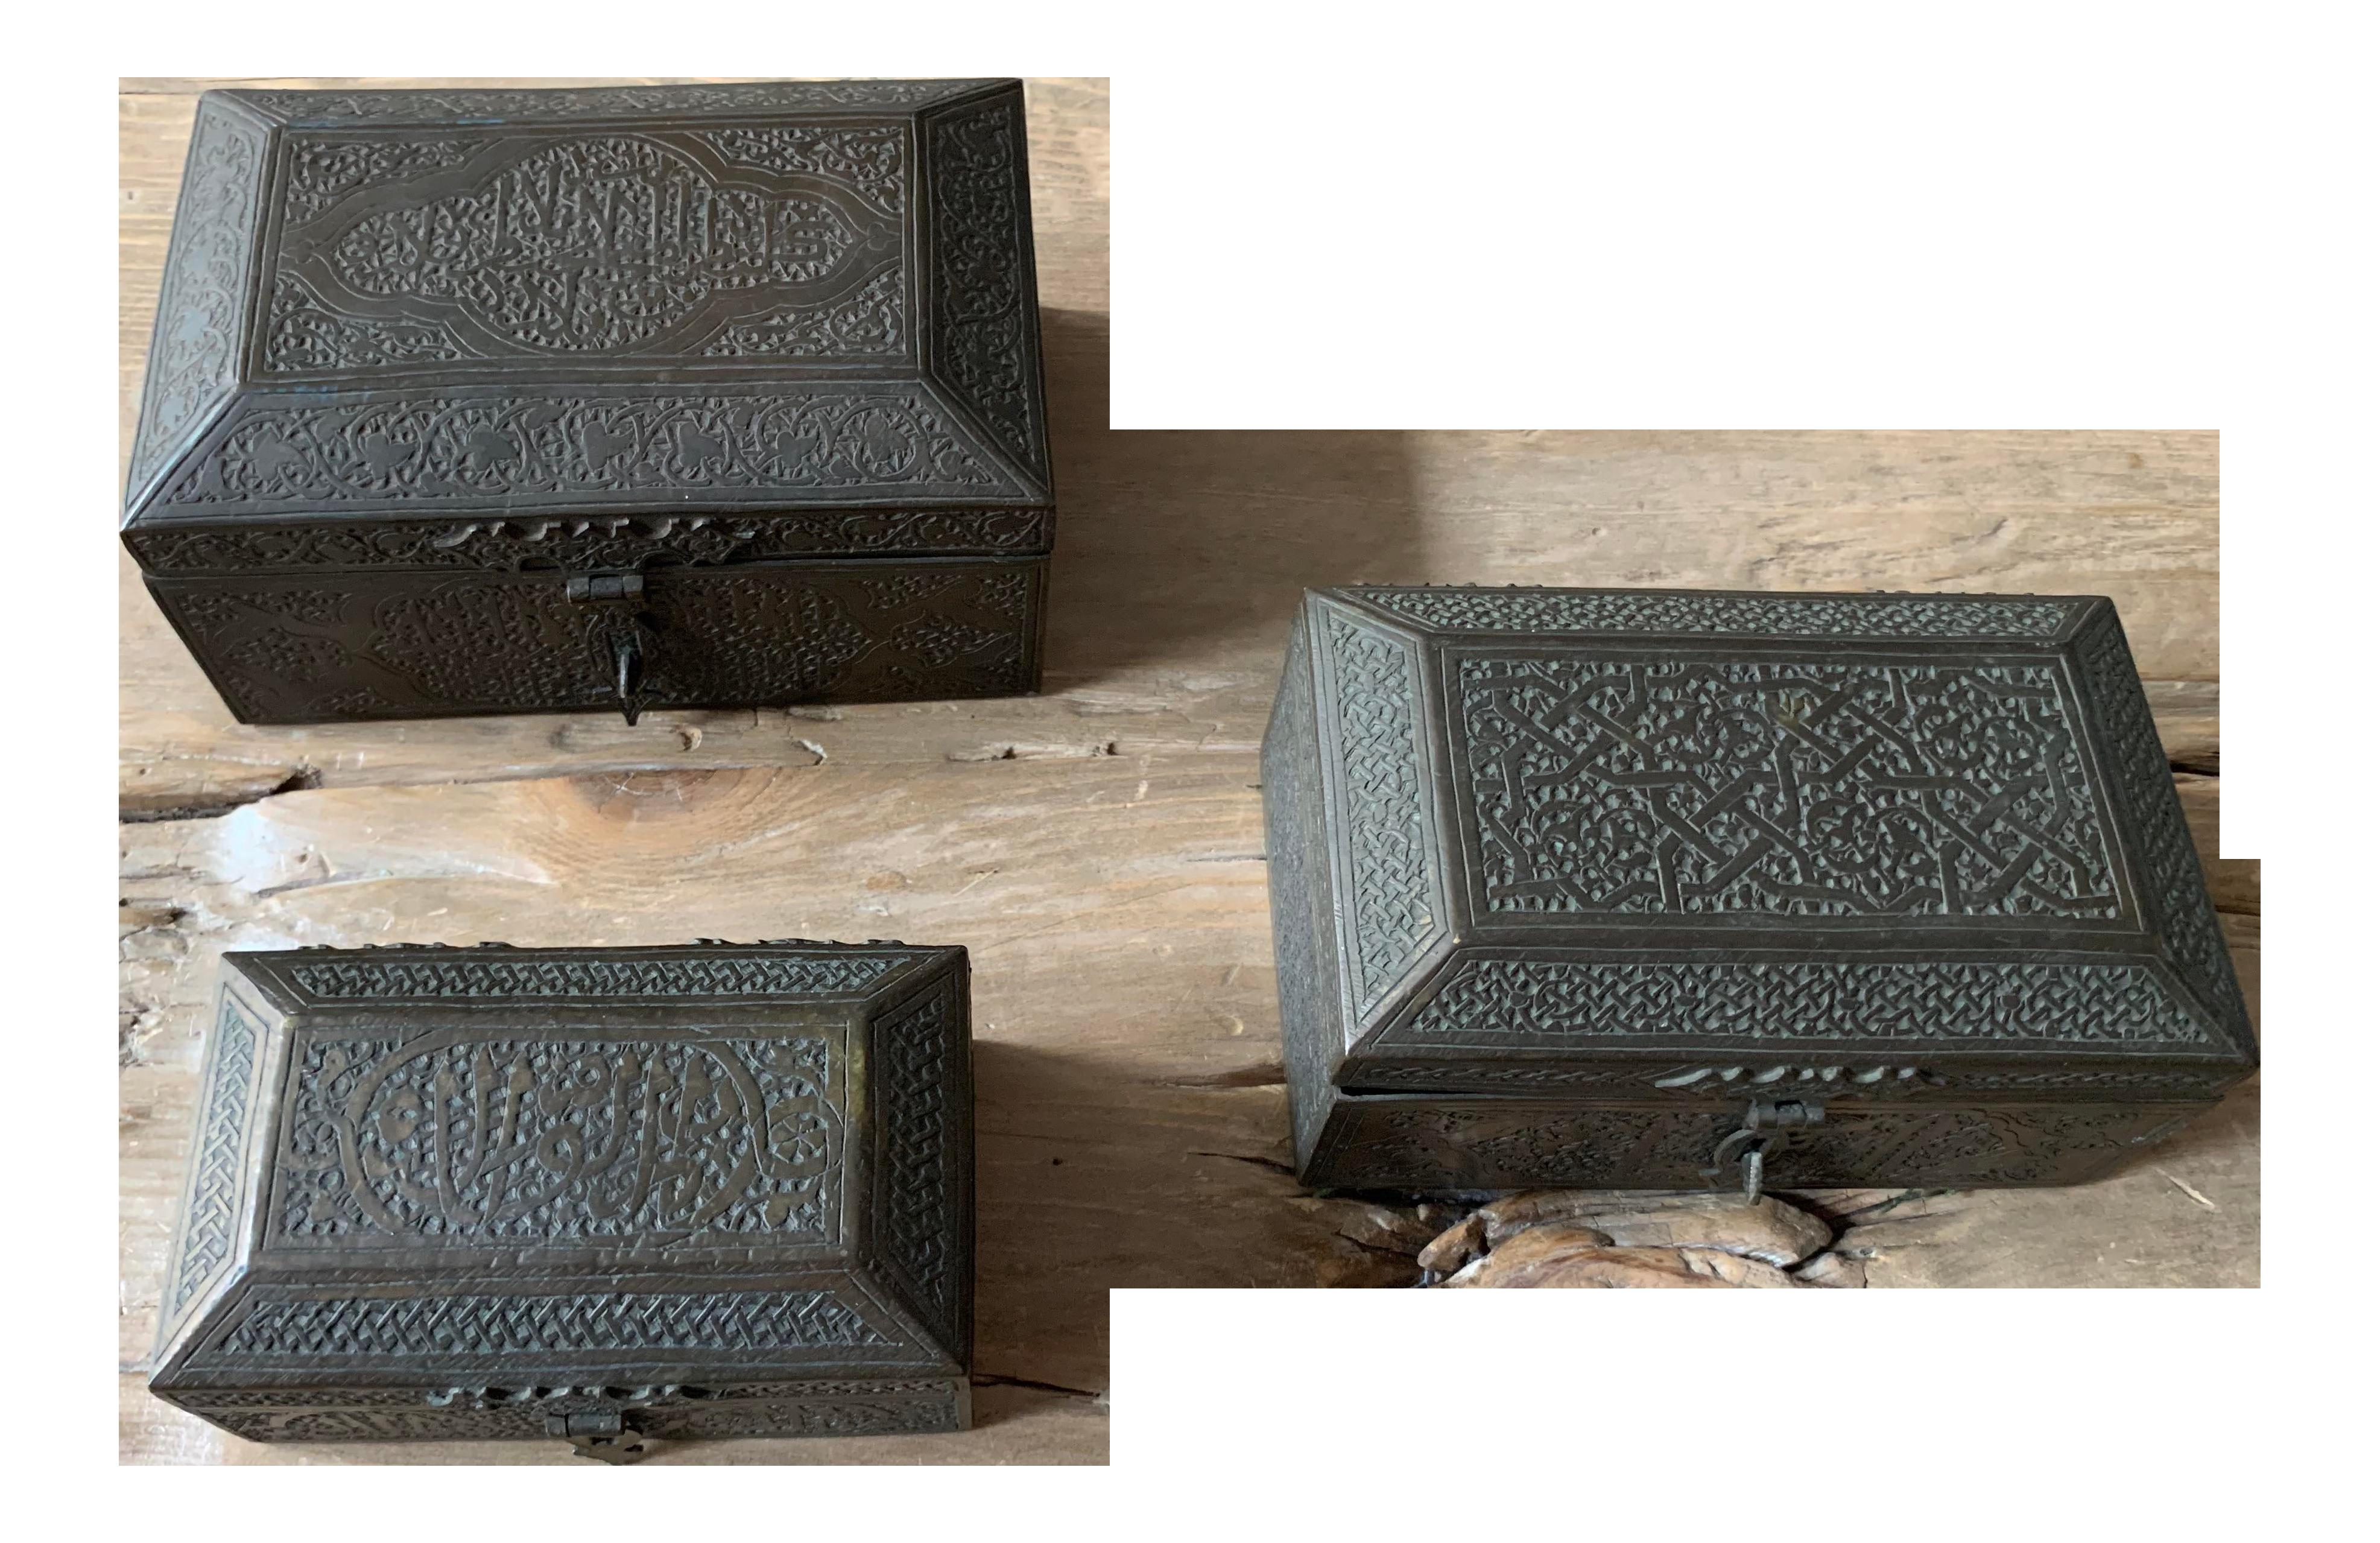 Awe Inspiring Turkish Ottoman Aged Brass Decorative Boxes Set Of 3 Inzonedesignstudio Interior Chair Design Inzonedesignstudiocom